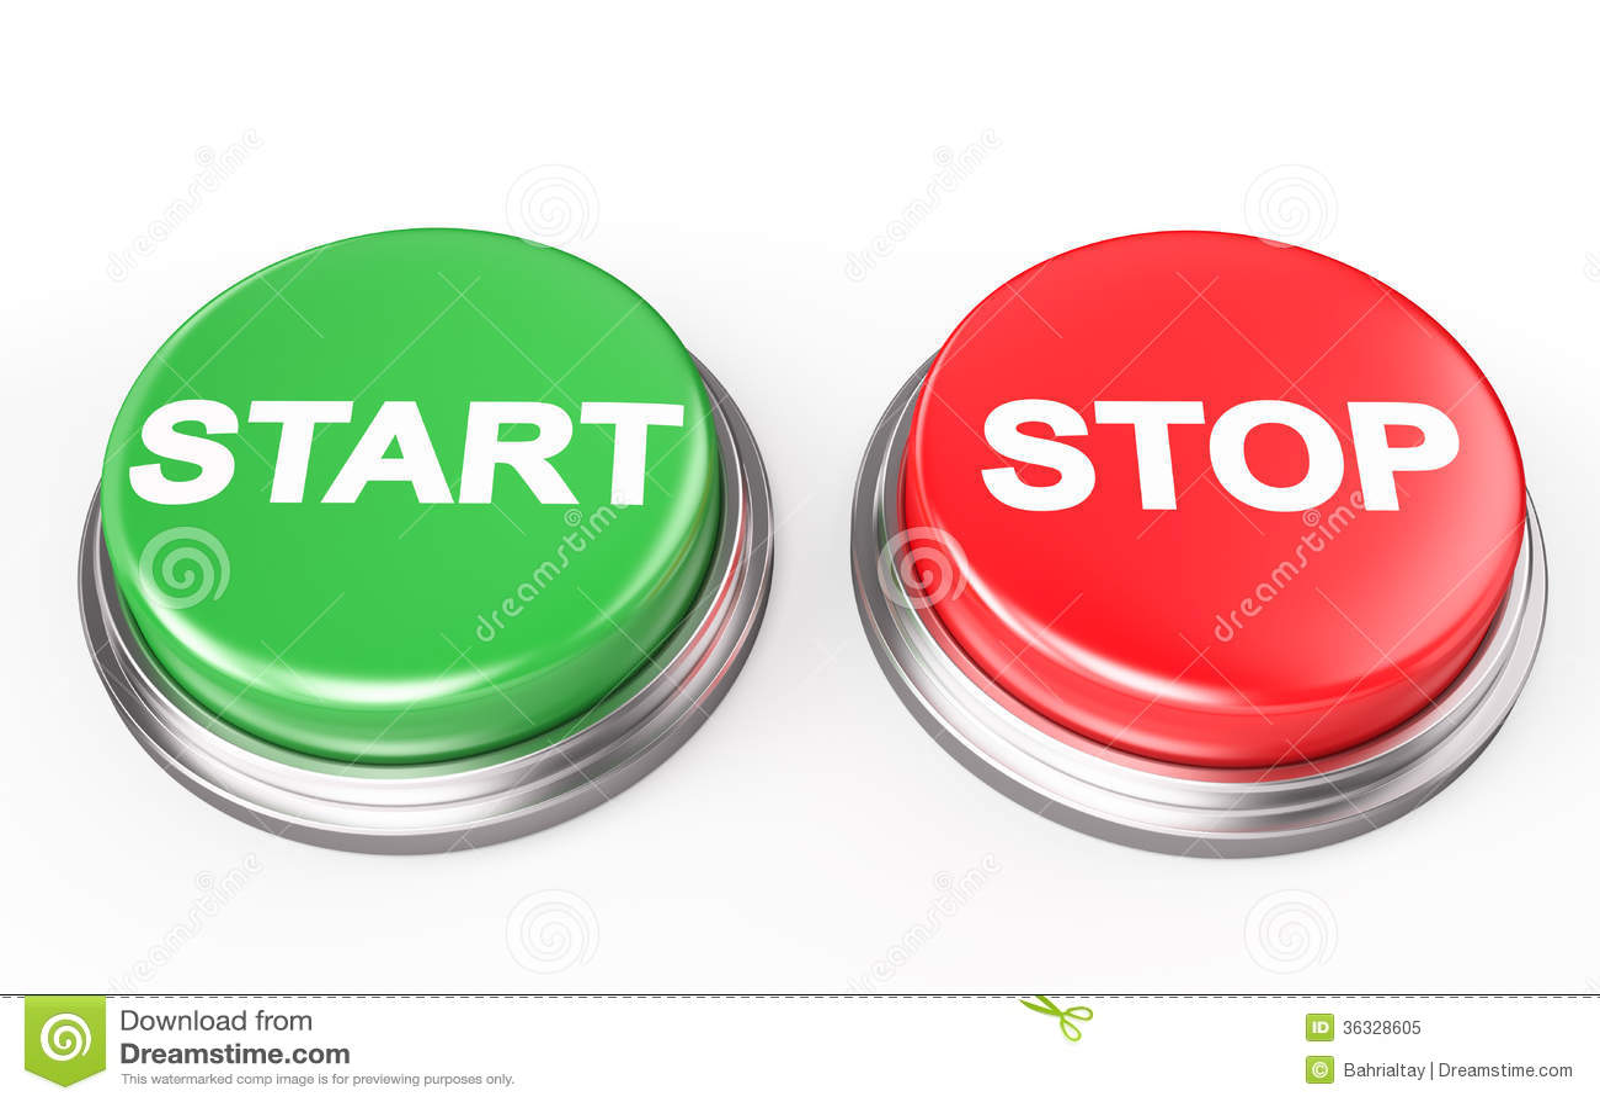 start stop button stock illustration image of copy power 36328605. Black Bedroom Furniture Sets. Home Design Ideas